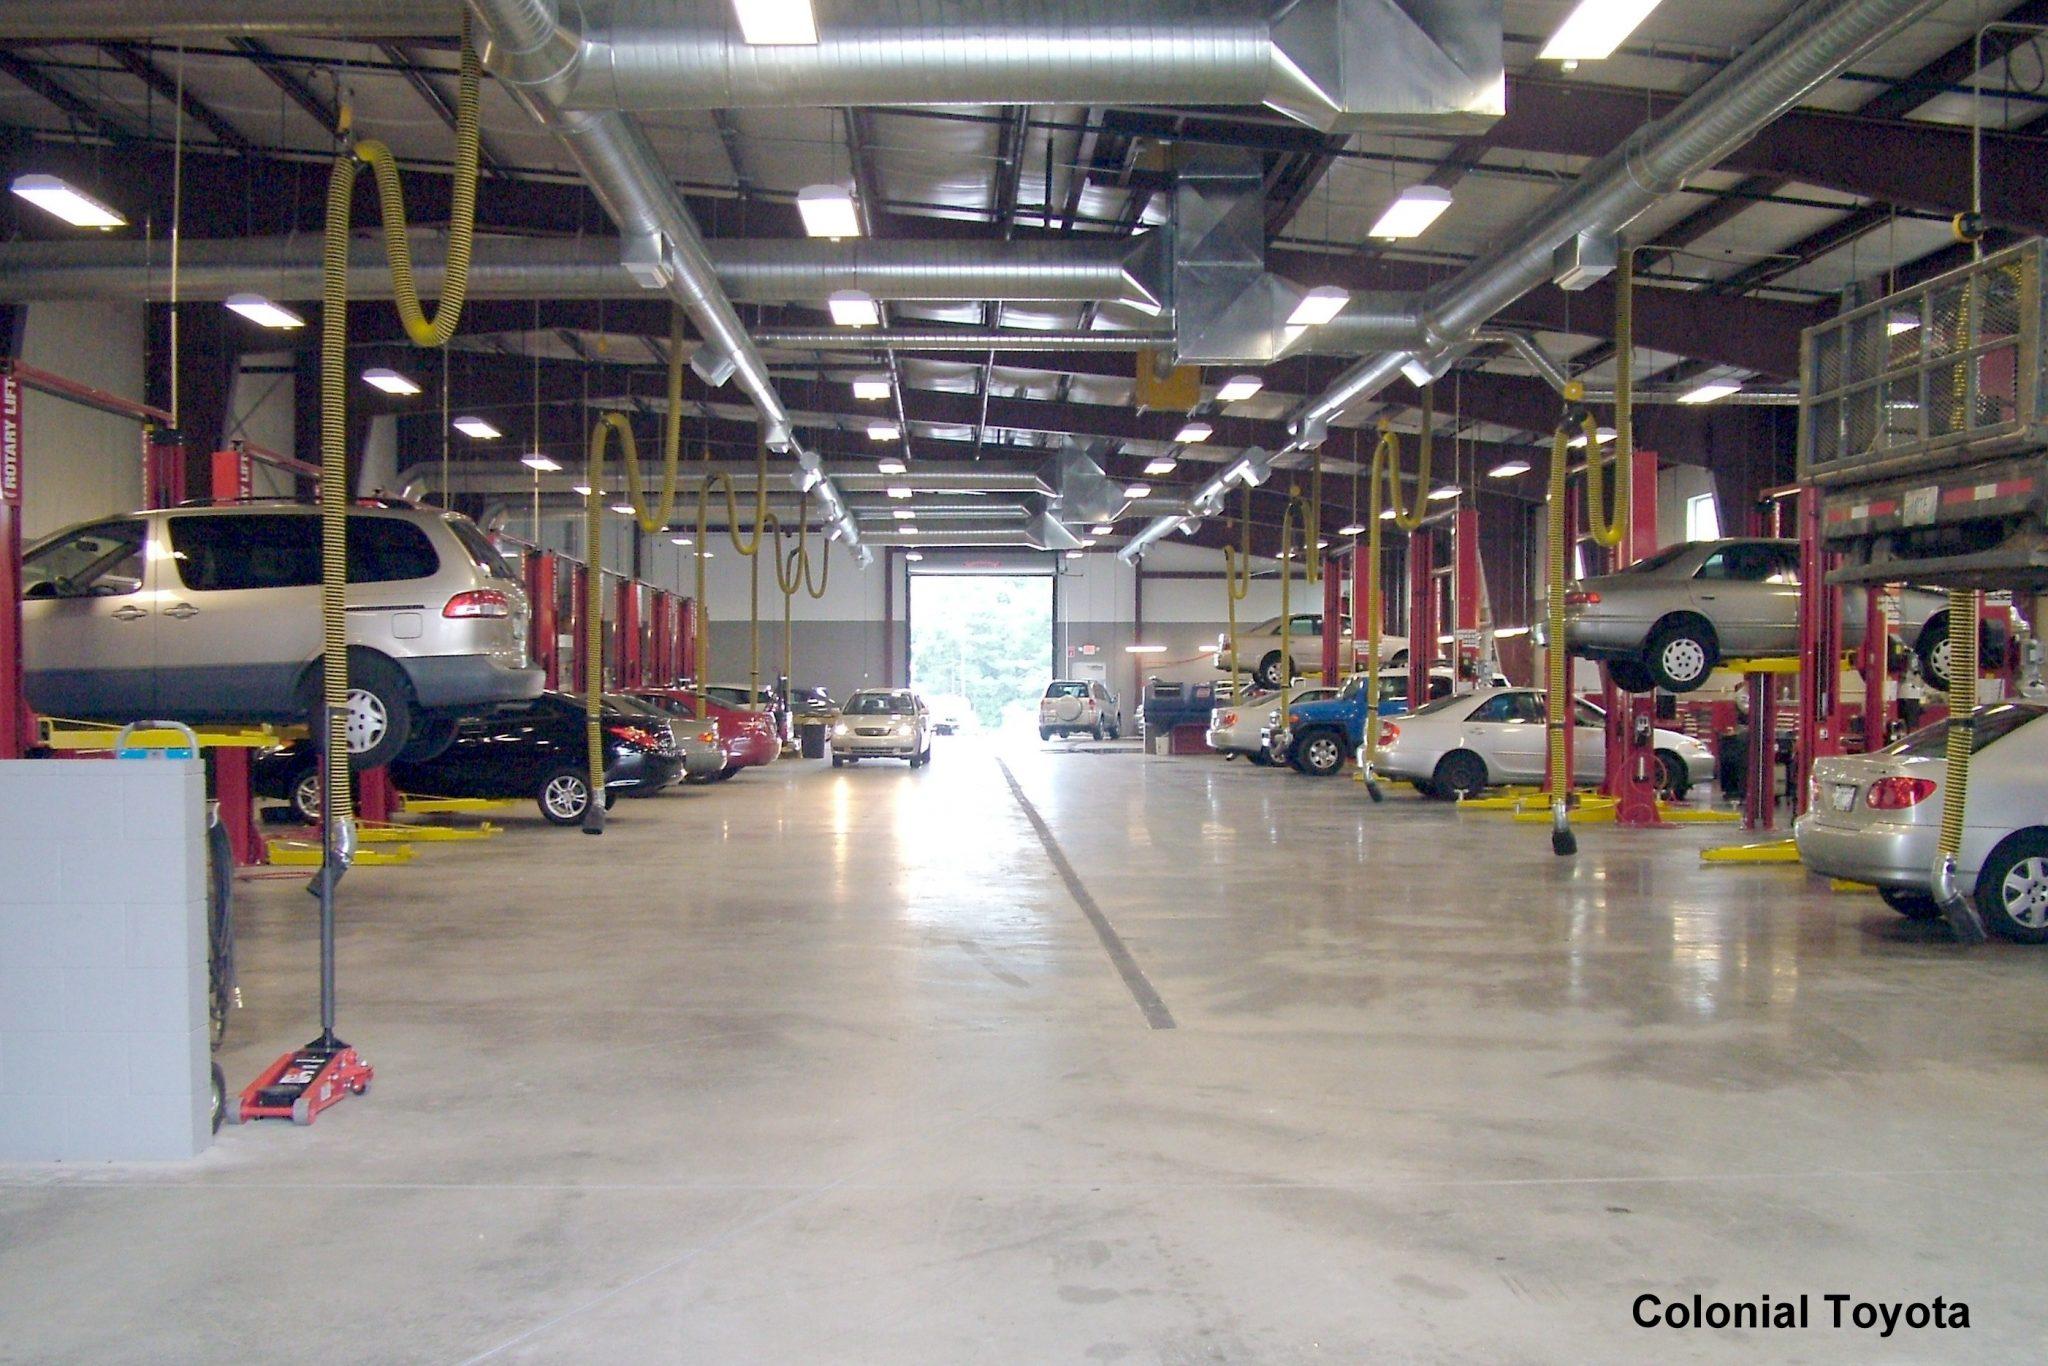 Colonial Toyota-Smithfield, RI